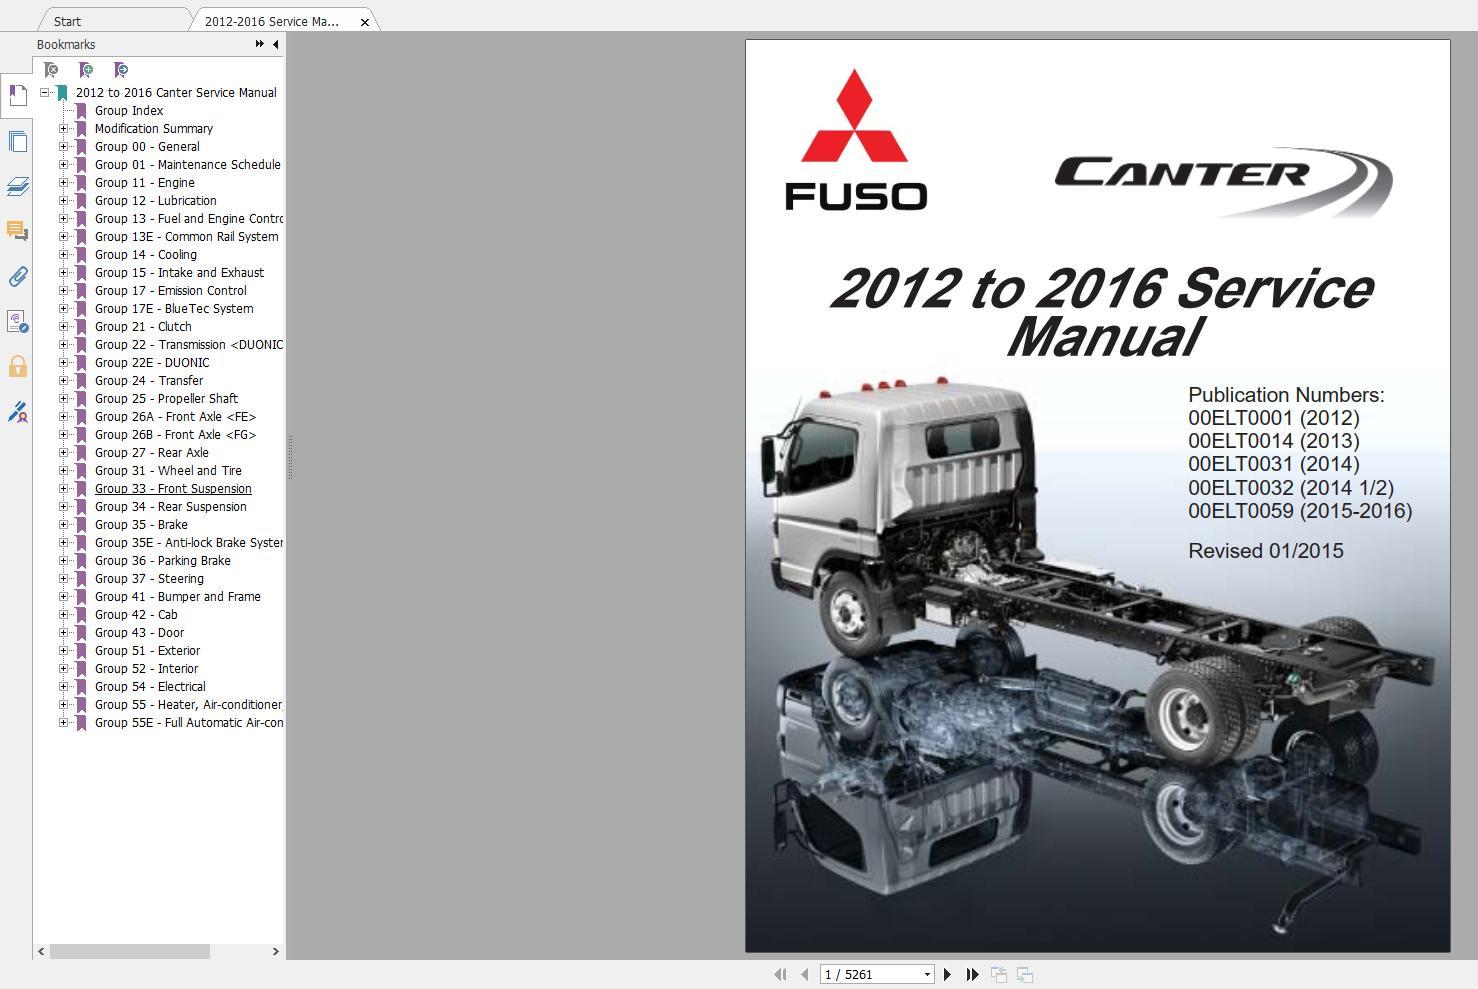 Mitsubishi_Truck_Fuso_2016_Service_Manual_Full_DVD8